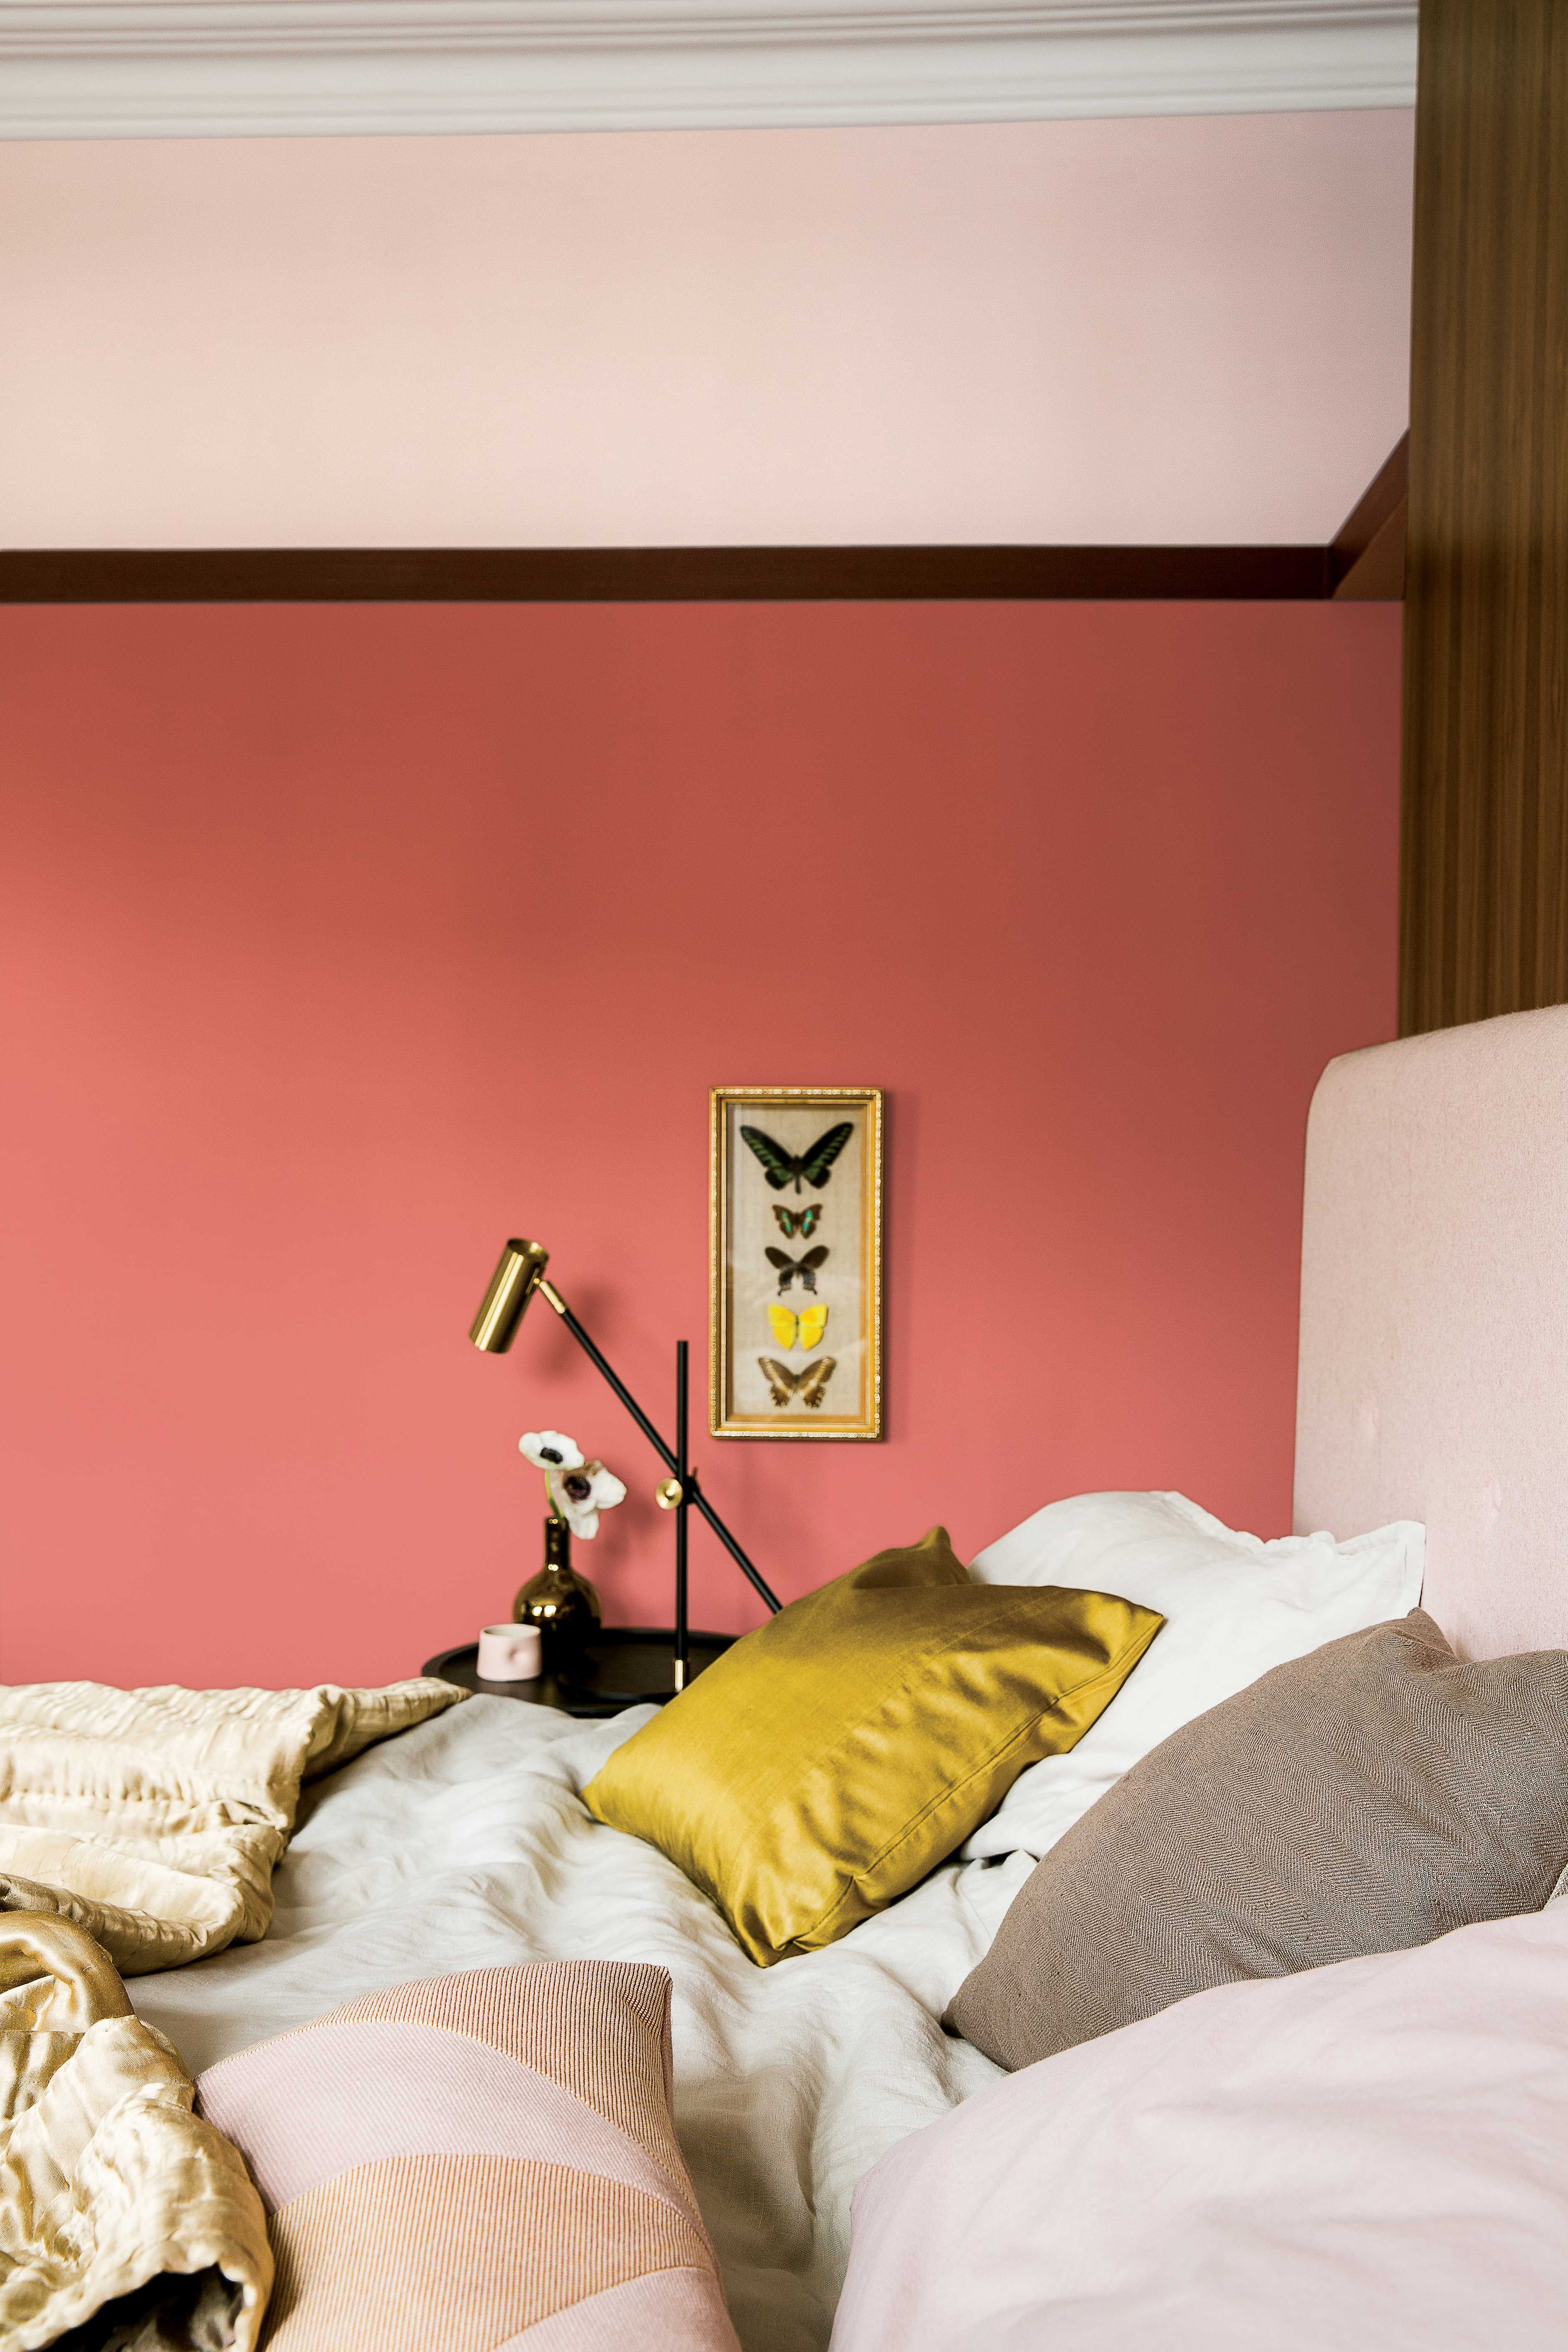 1000+ images about -Kleuren inspiratie 2016-2017- on Pinterest ...